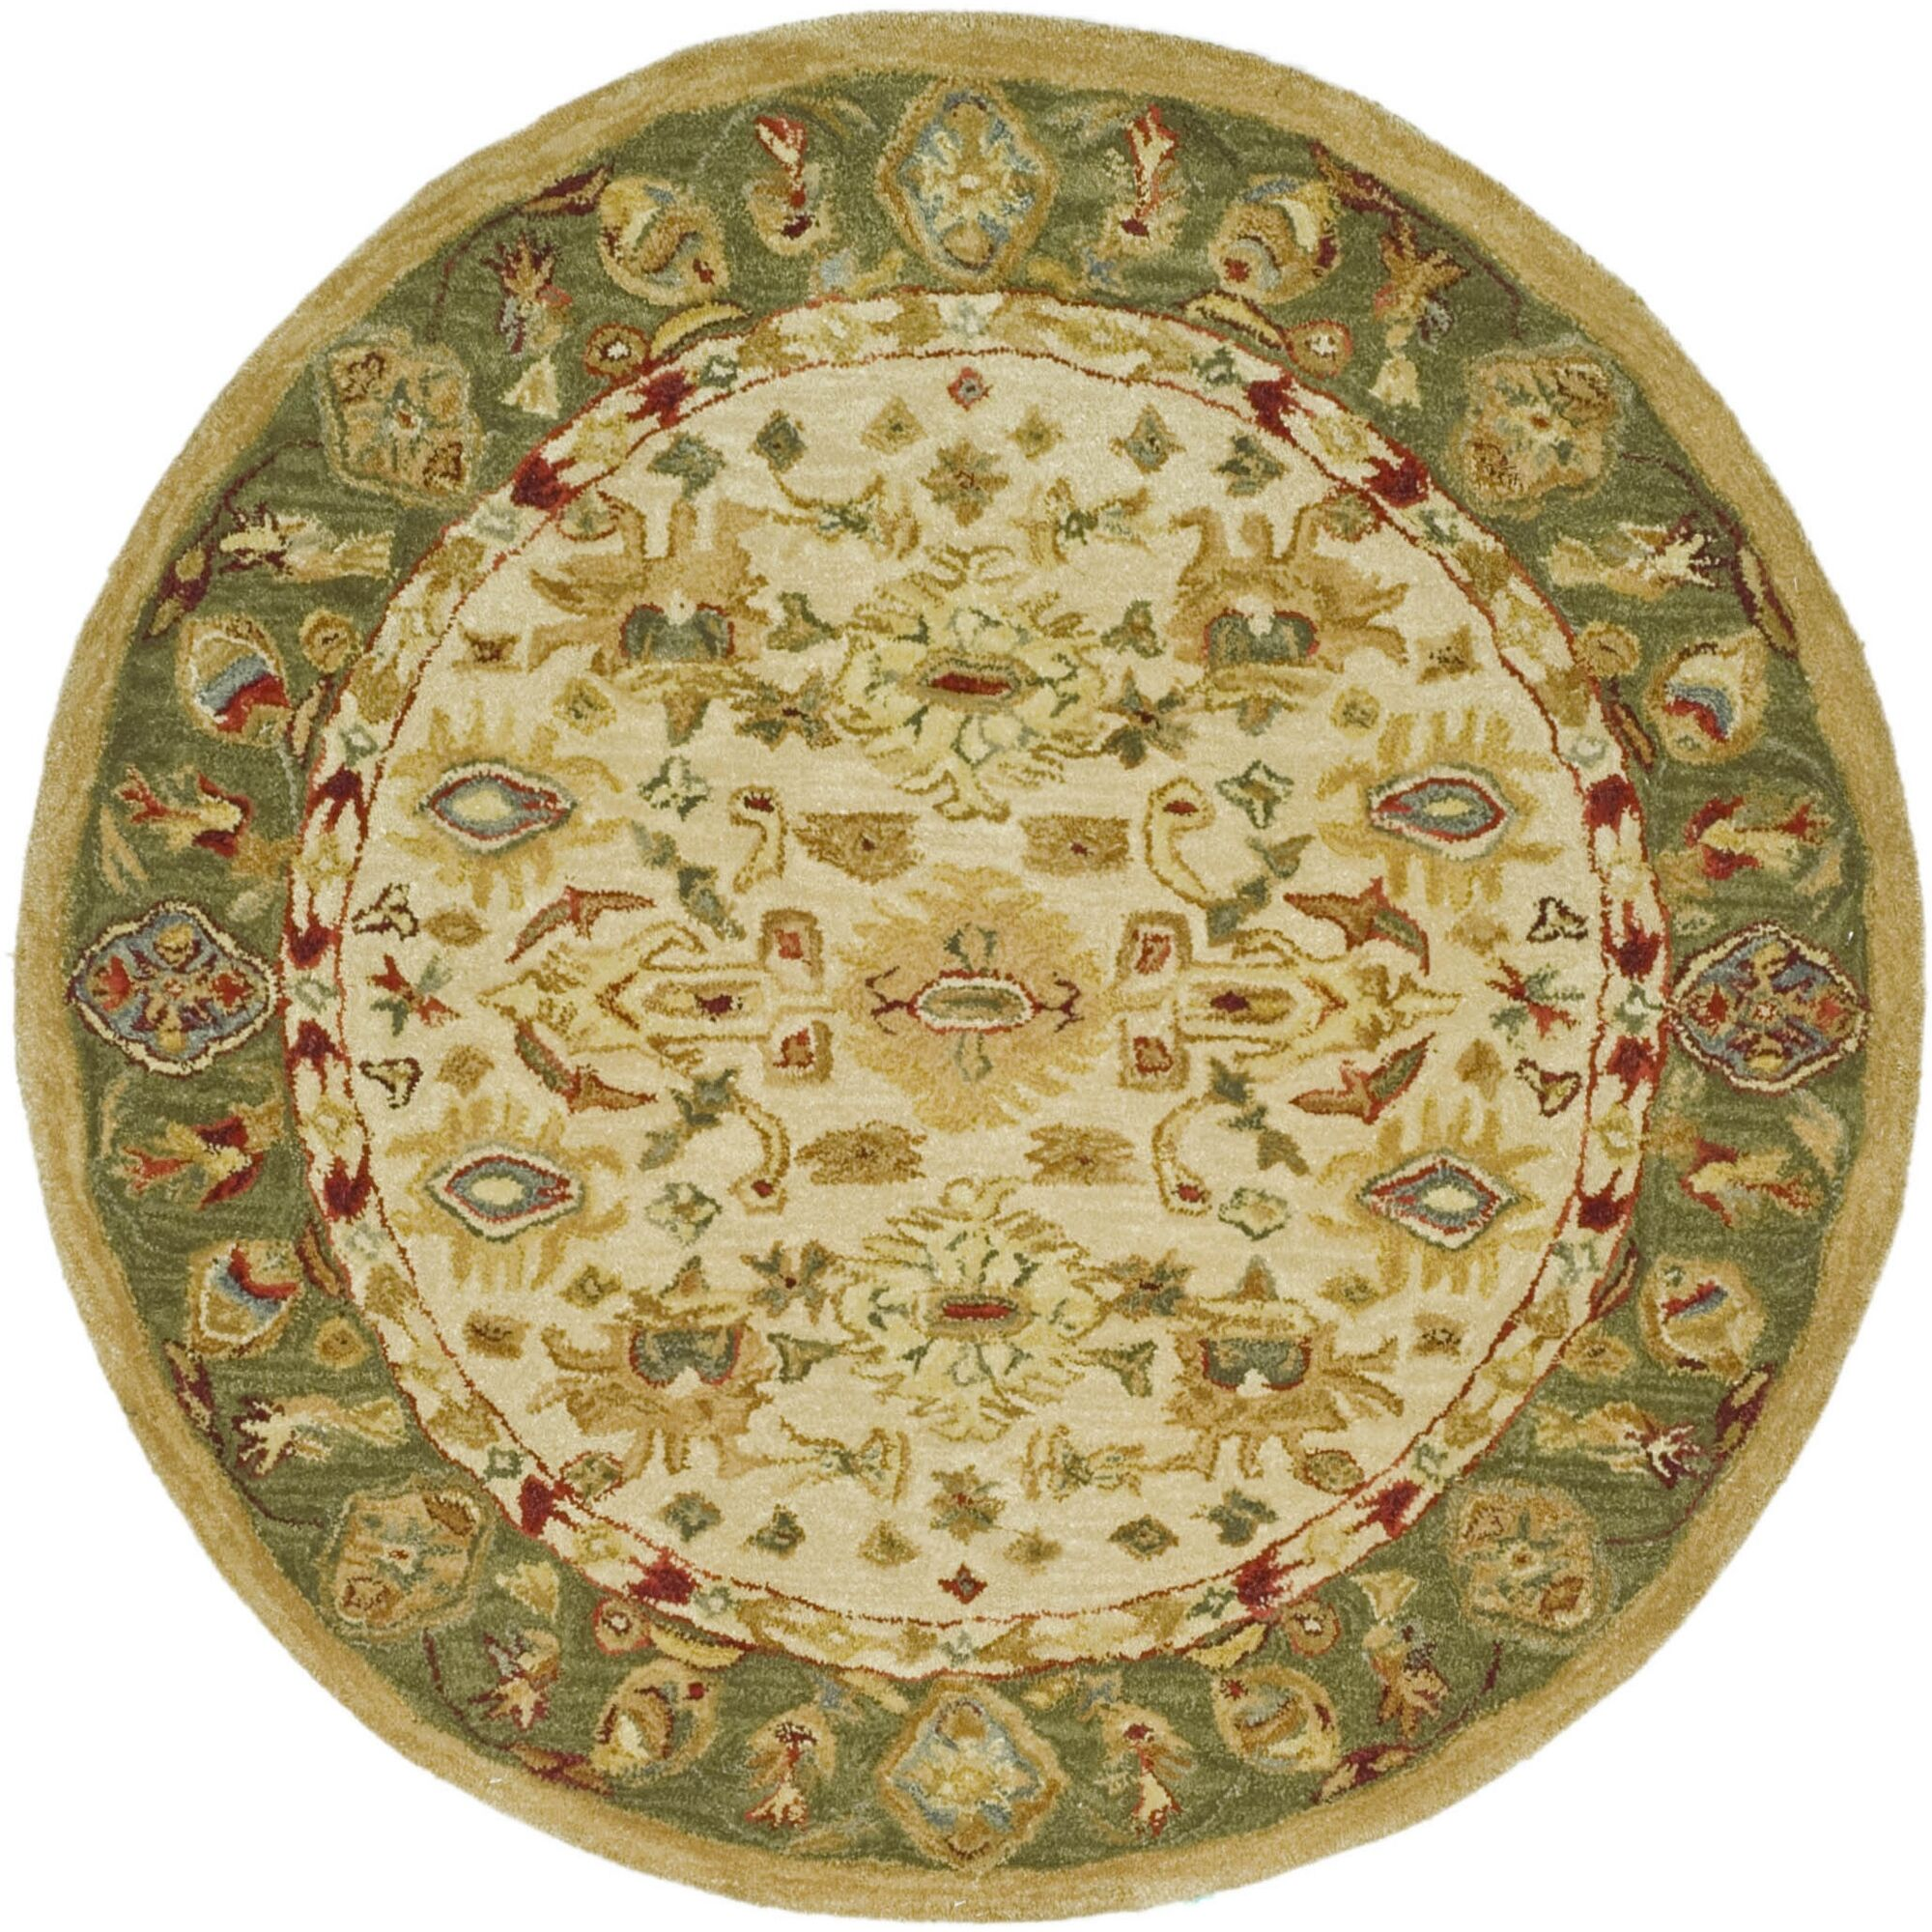 Anatolia Cream/Dark Sage Area Rug Rug Size: Round 8'